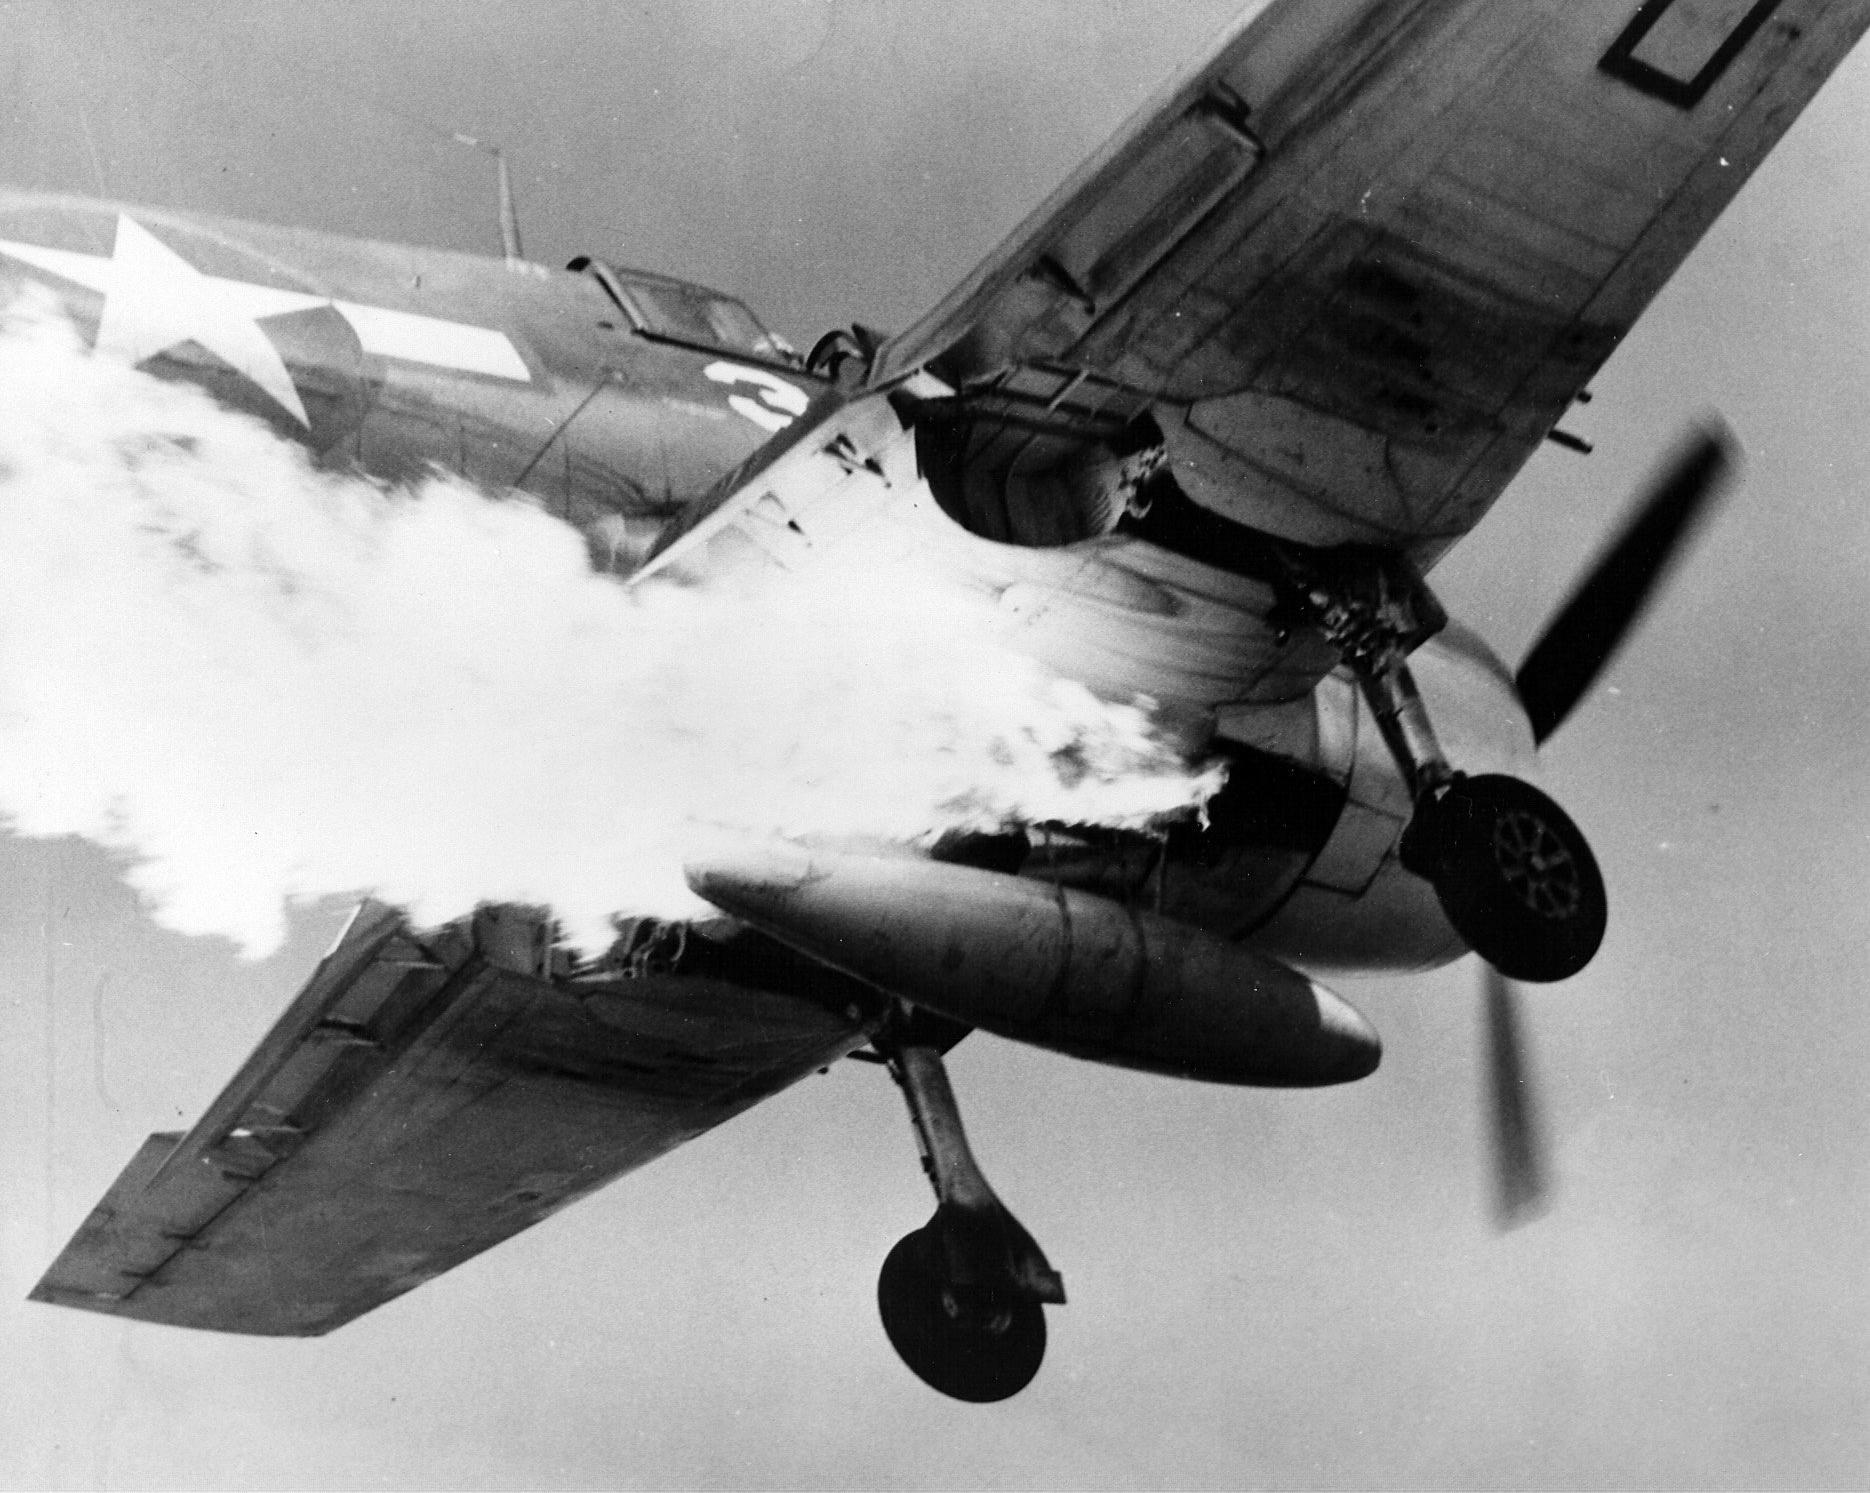 Grumman F6F 3 Hellcat VF 25 White 3 LTJG AW Magee CVL 25 USS Cowpens 20th Nov 1943 01